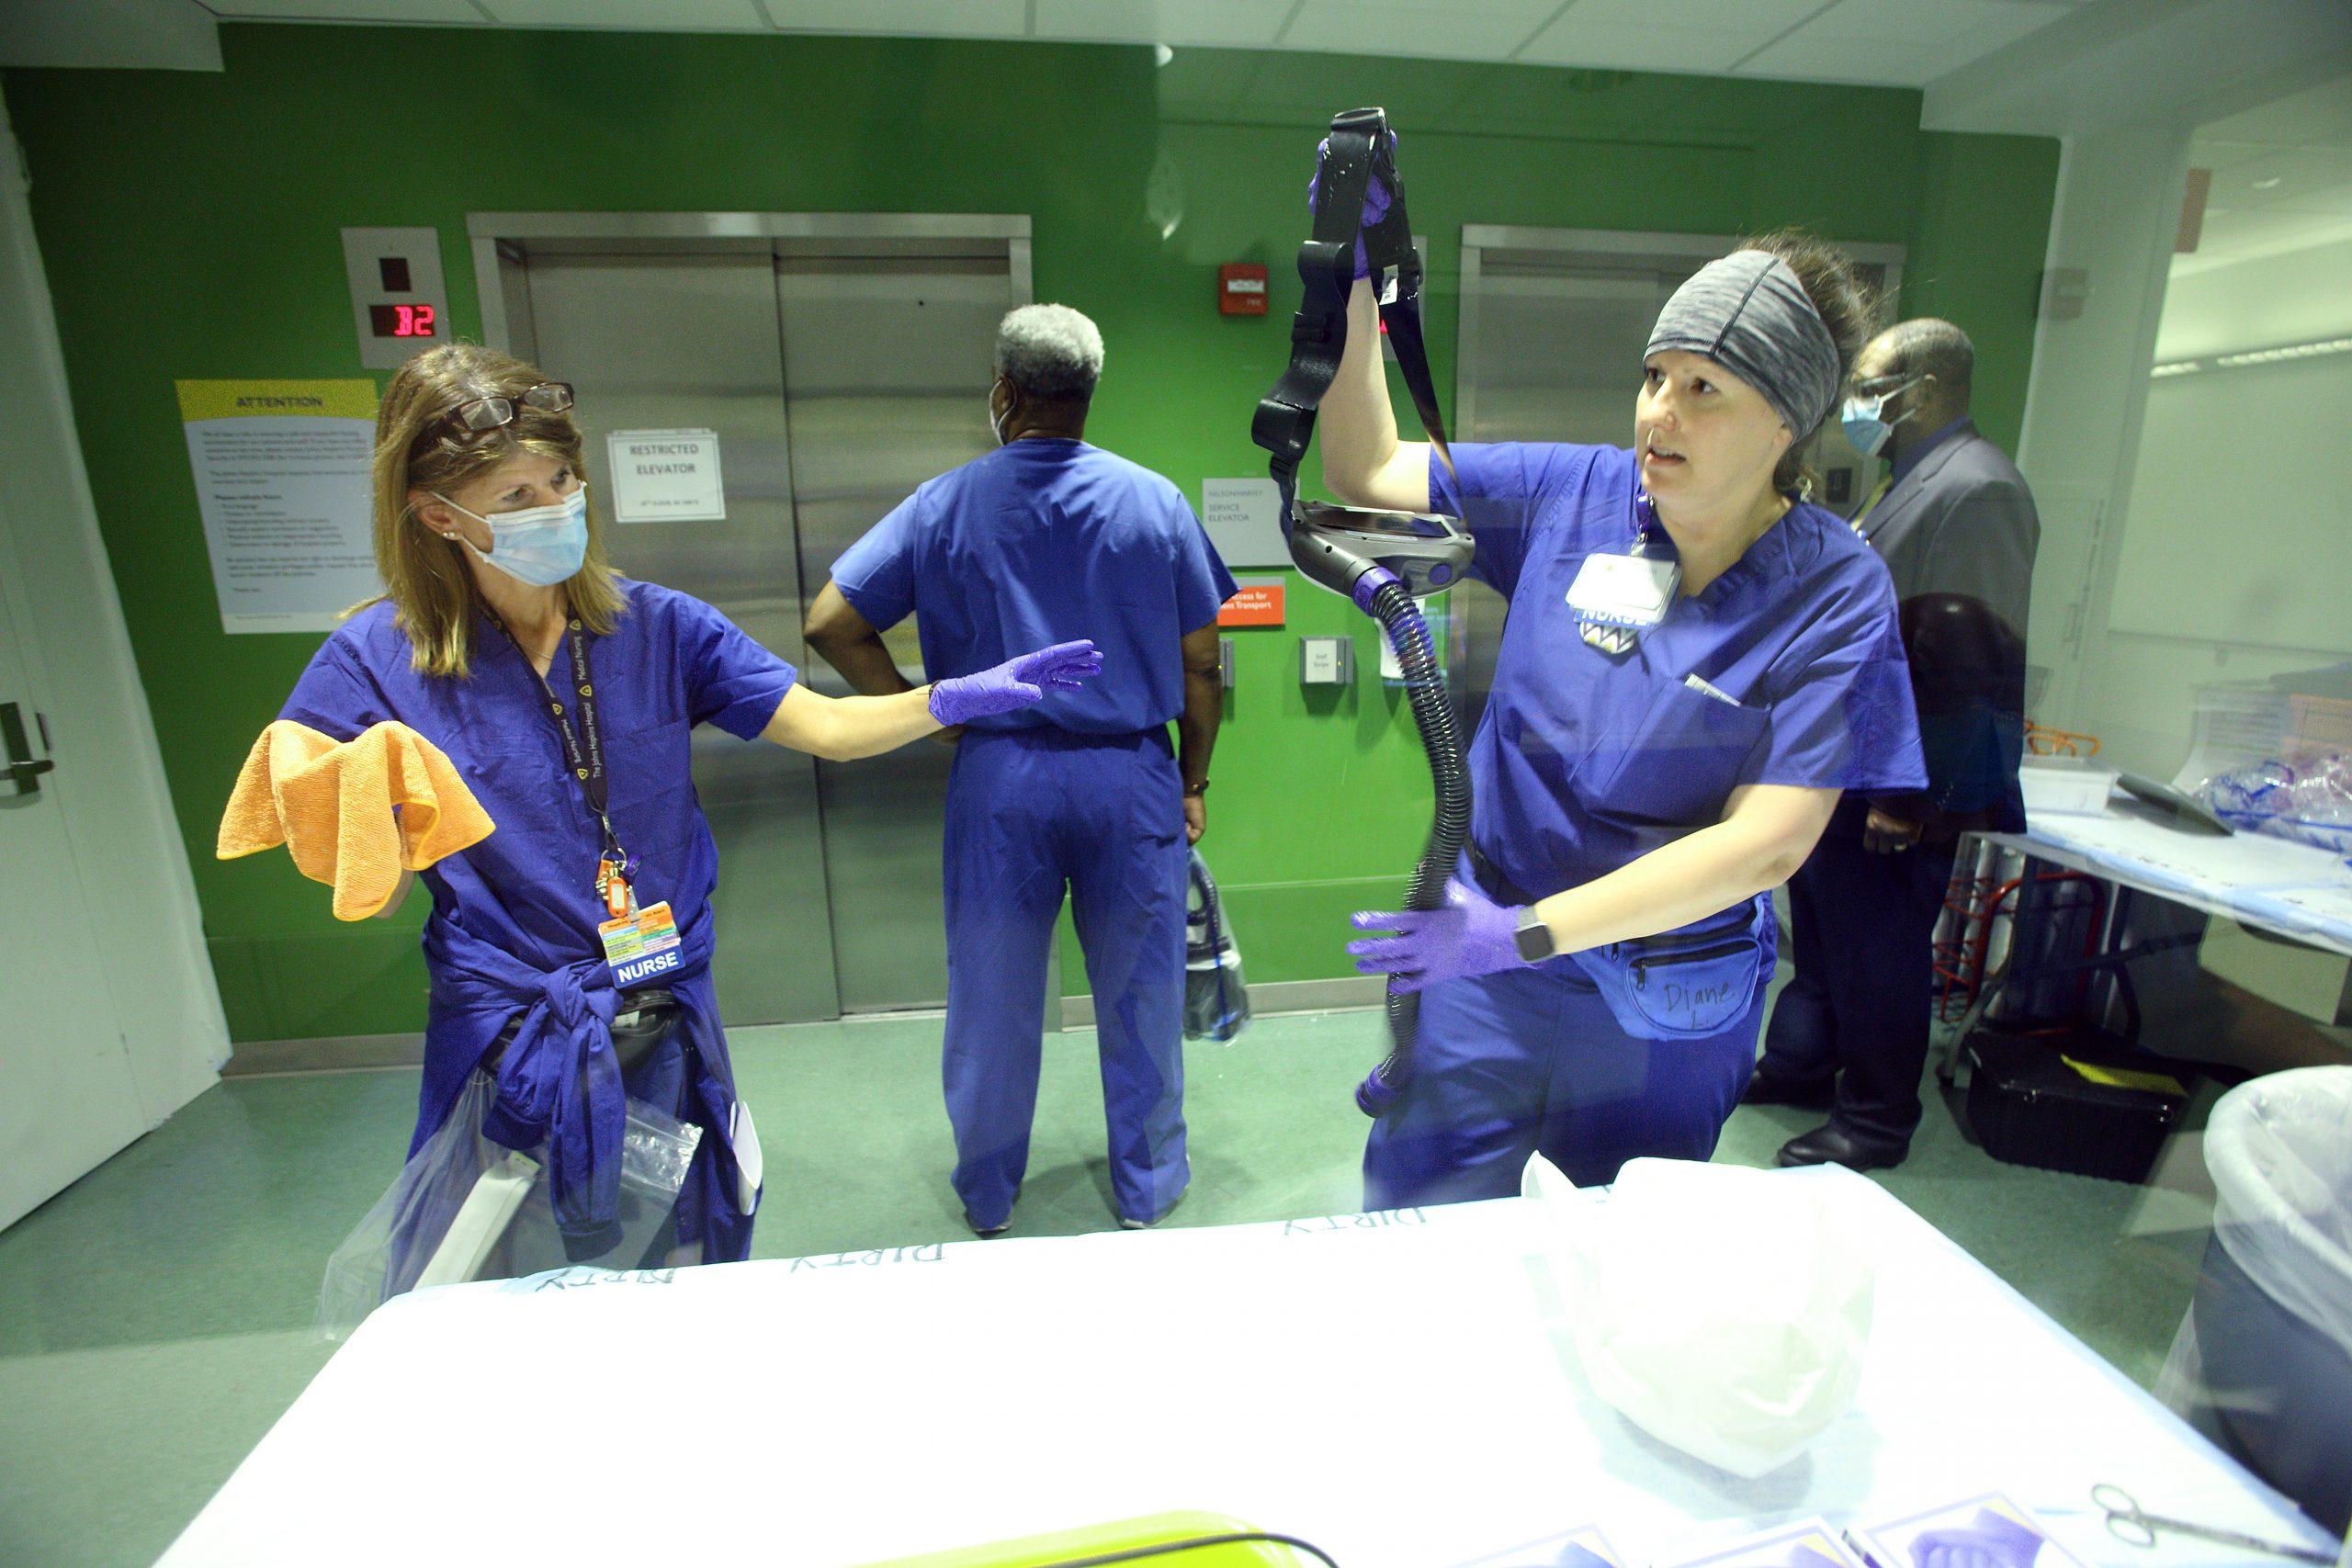 COVID JHH 56 - Nelson 8 Covid Acute DOFFING Deborah Kraft RN, Diane Lewicki BSN